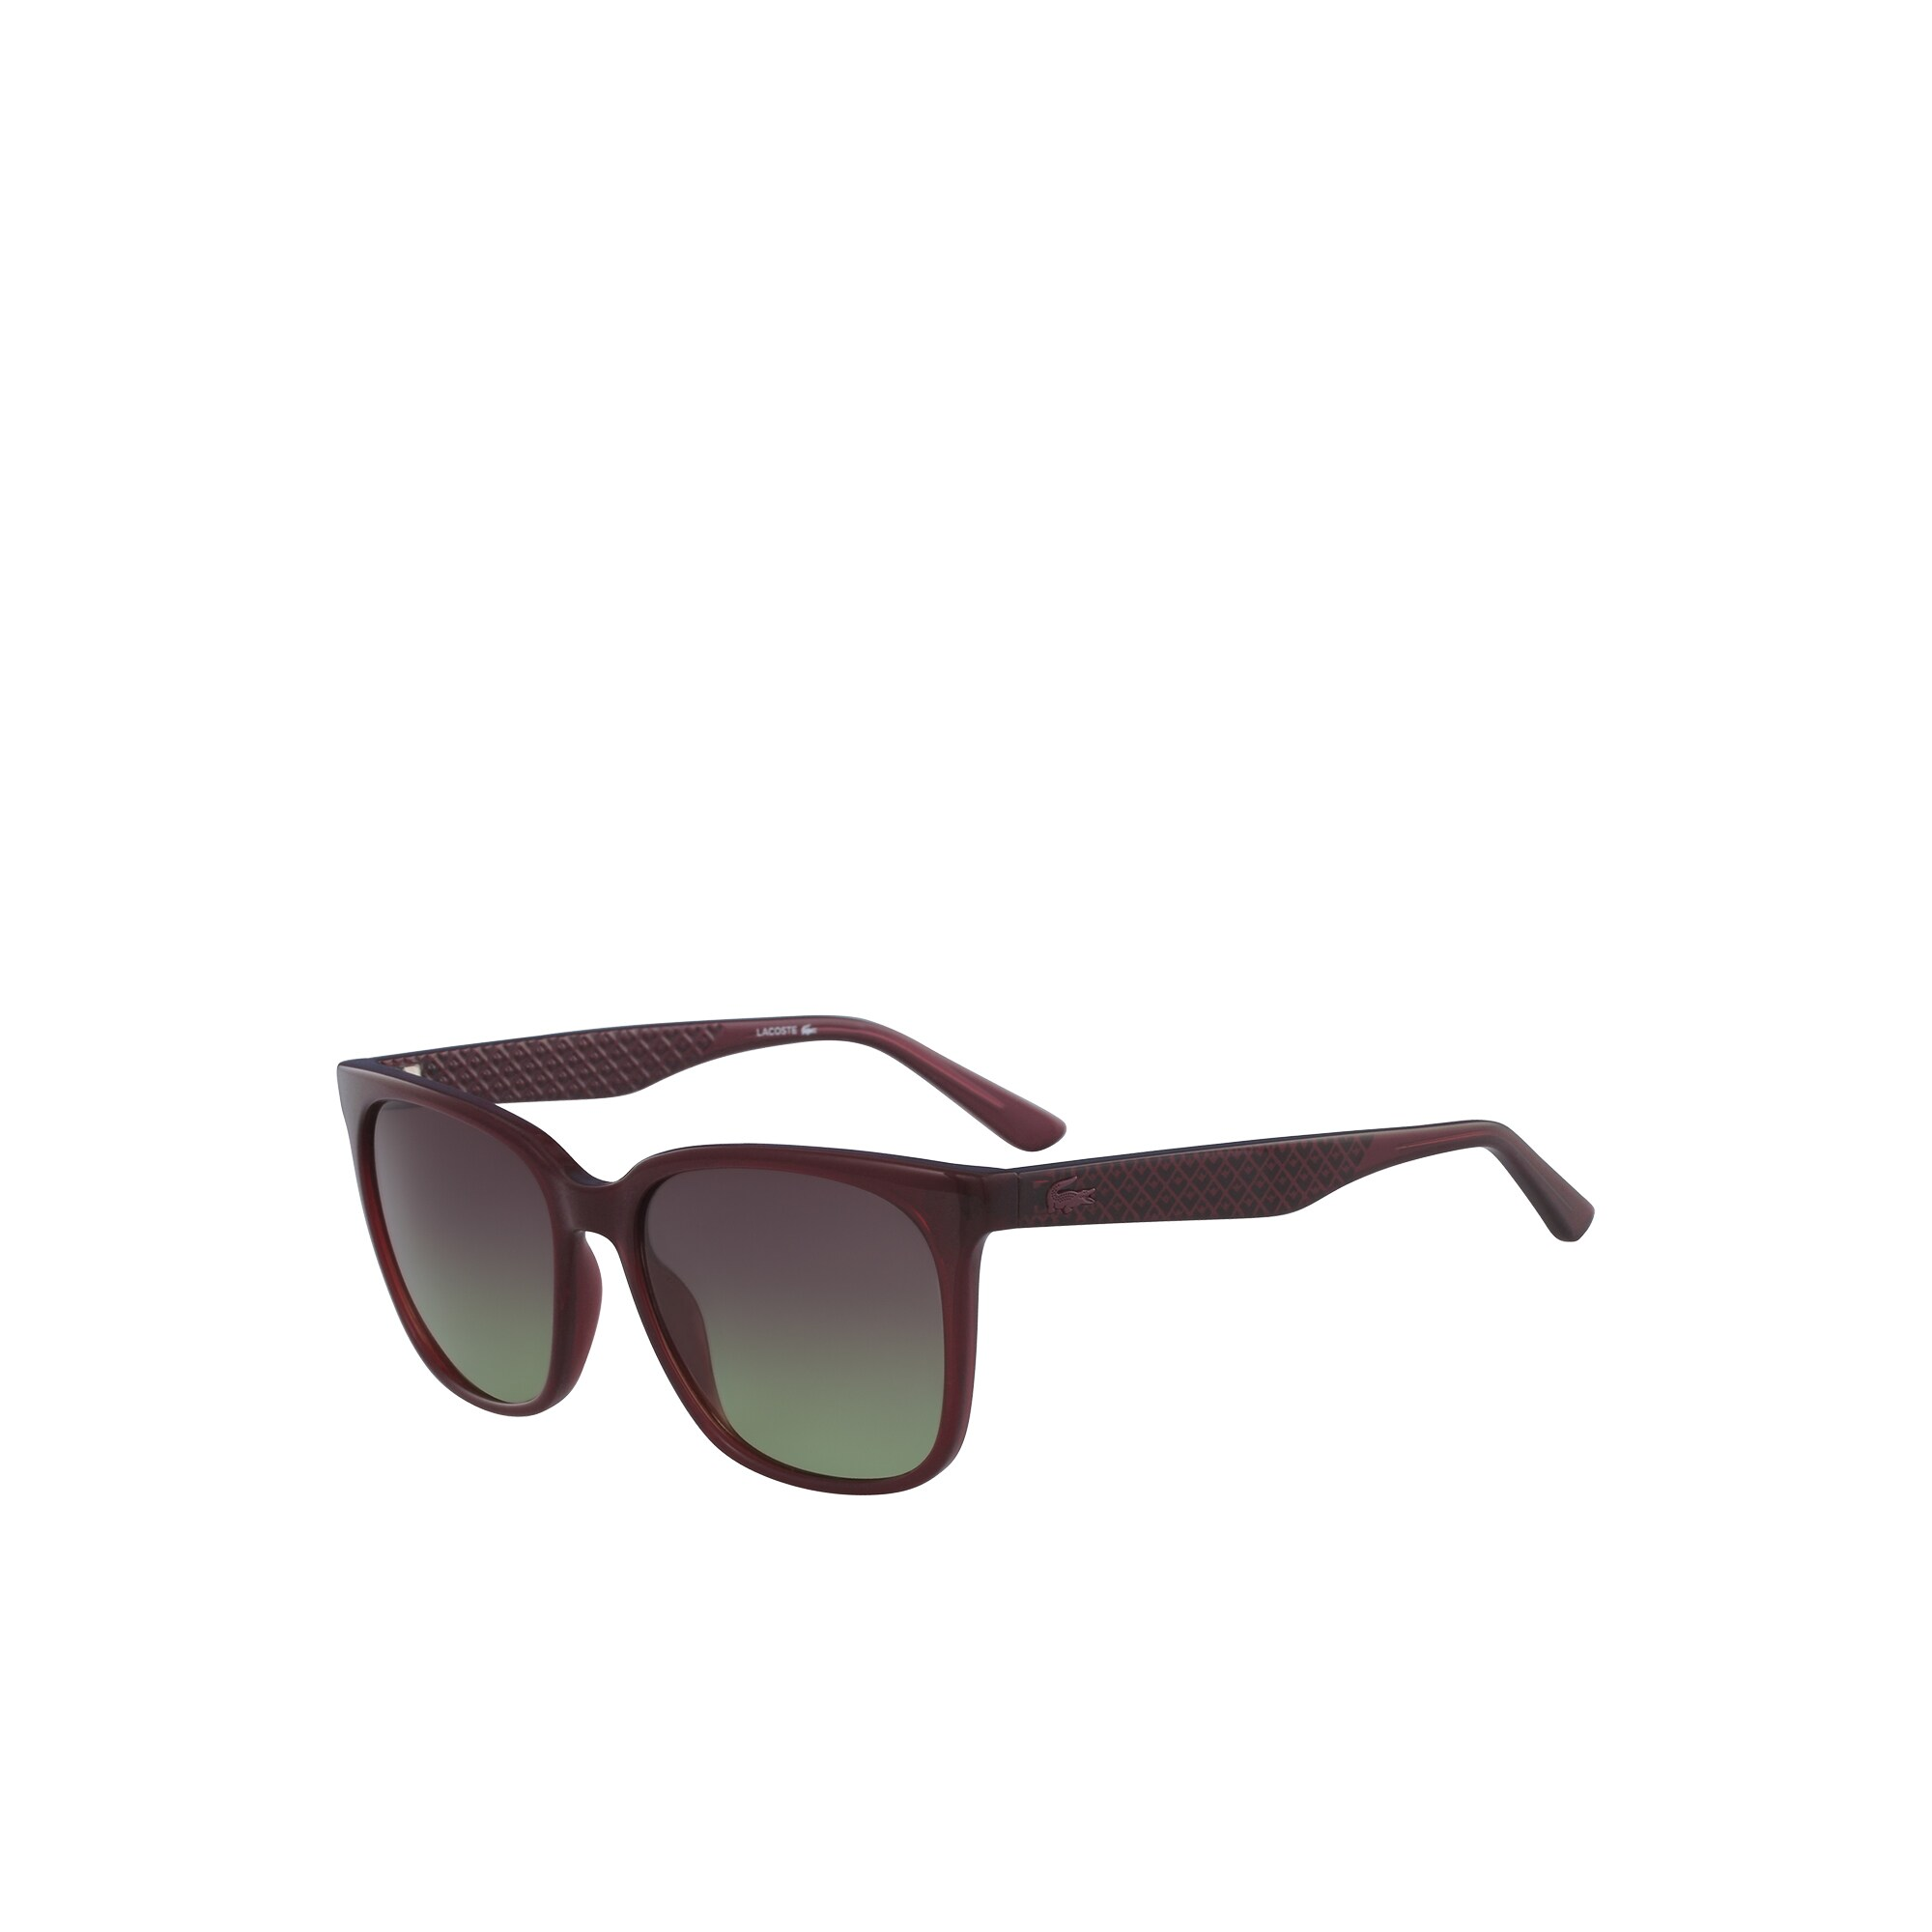 Damen-Sonnenbrille Piqué